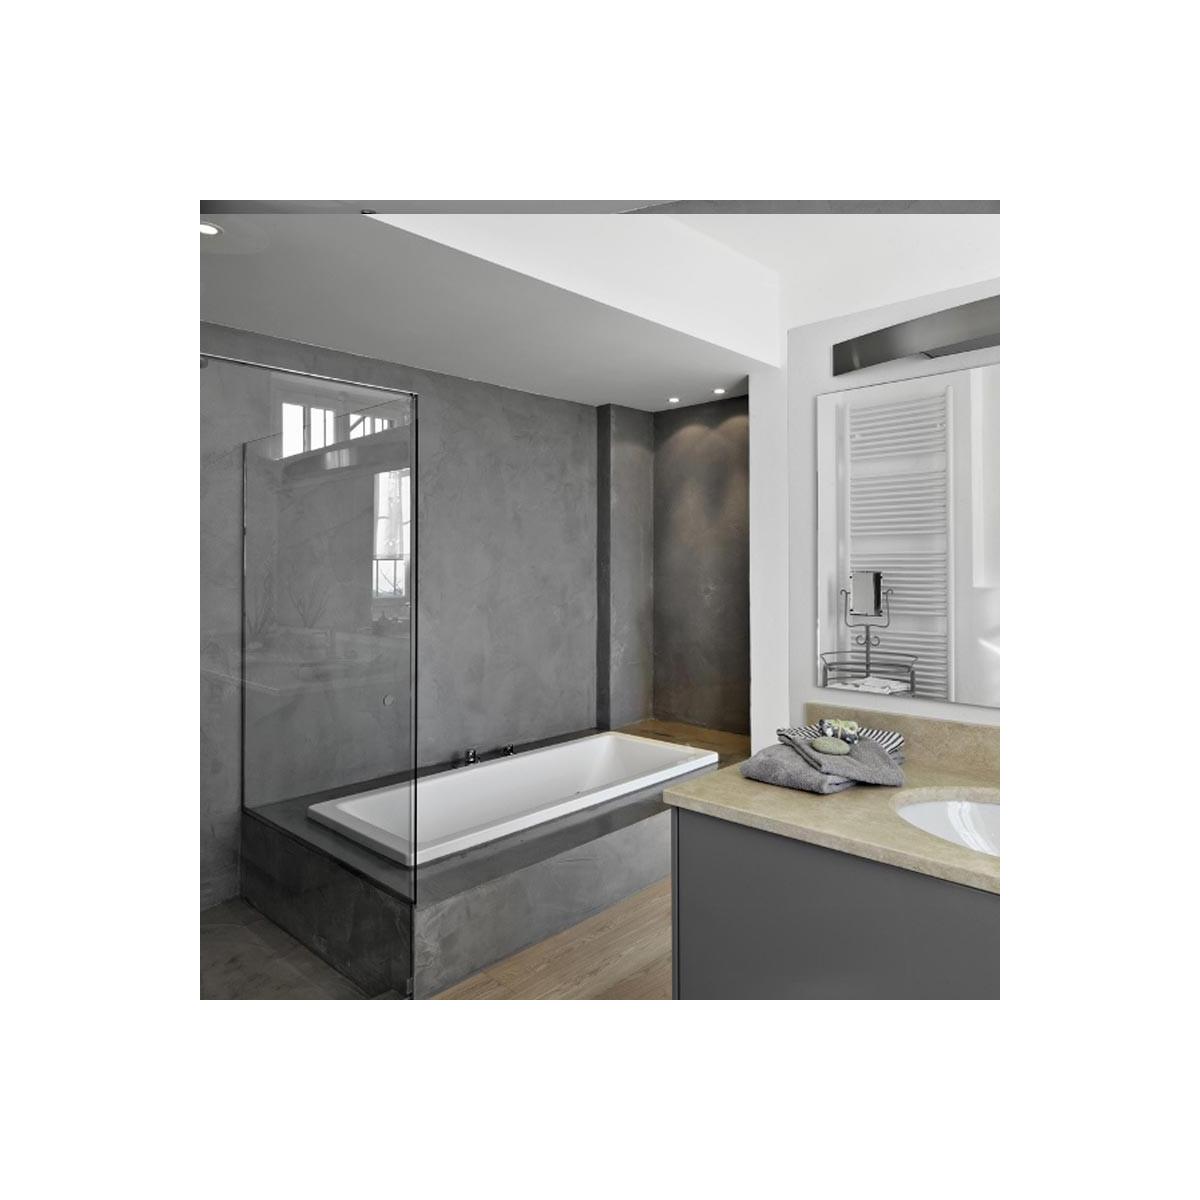 B ton cir salle de bain douche italienne enduit d coratif mural kit - Salle de bain italien ...